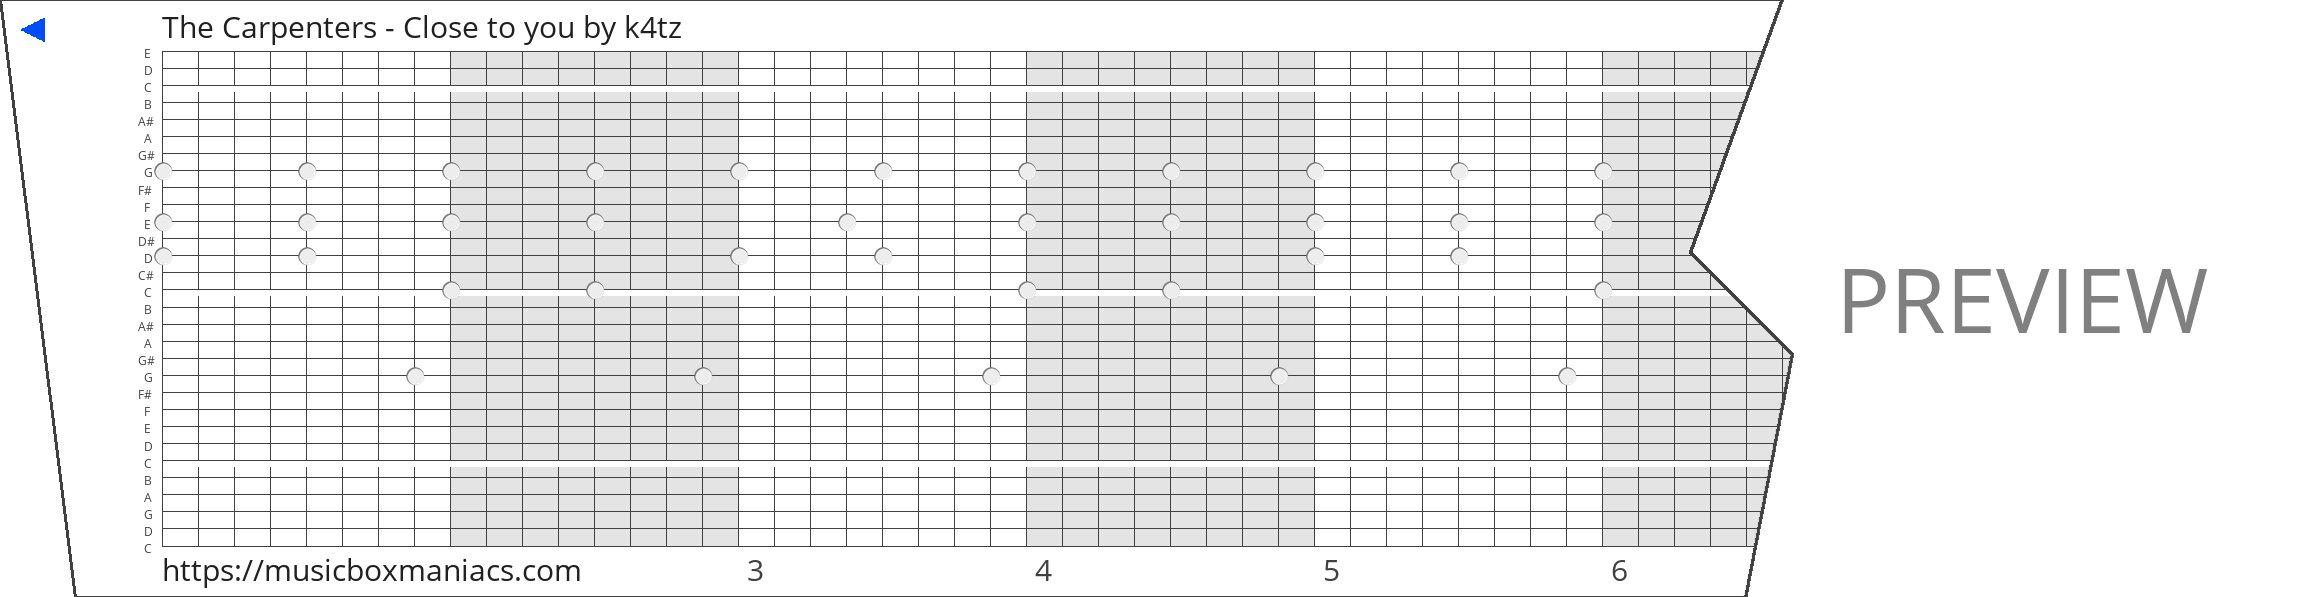 The Carpenters - Close to you 30 note music box paper strip